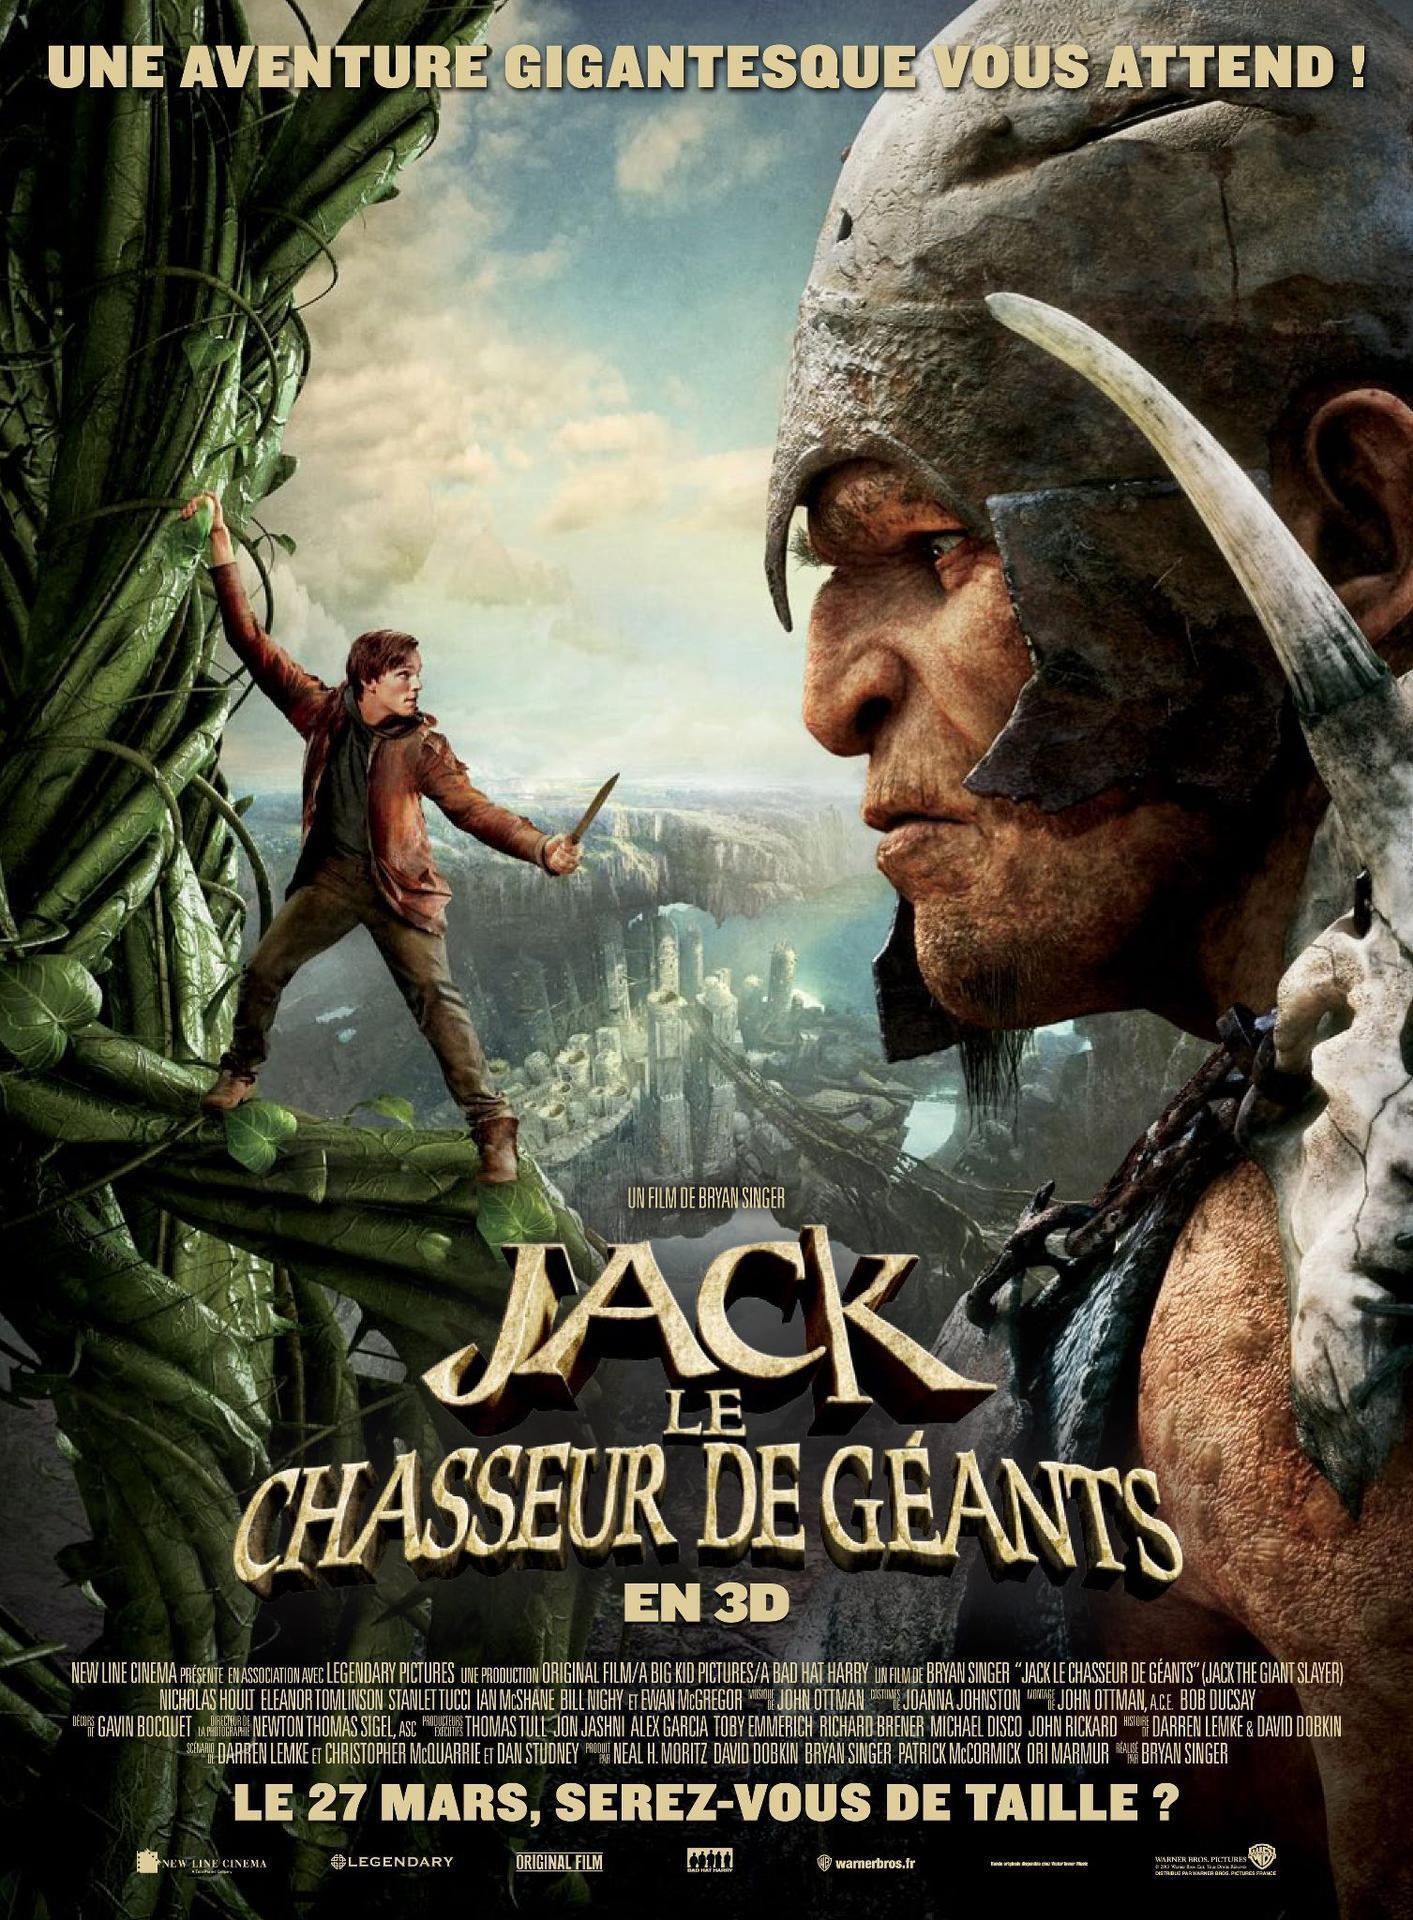 https://www.seriebox.com/cine/jack-le-chasseur-de-geants.html